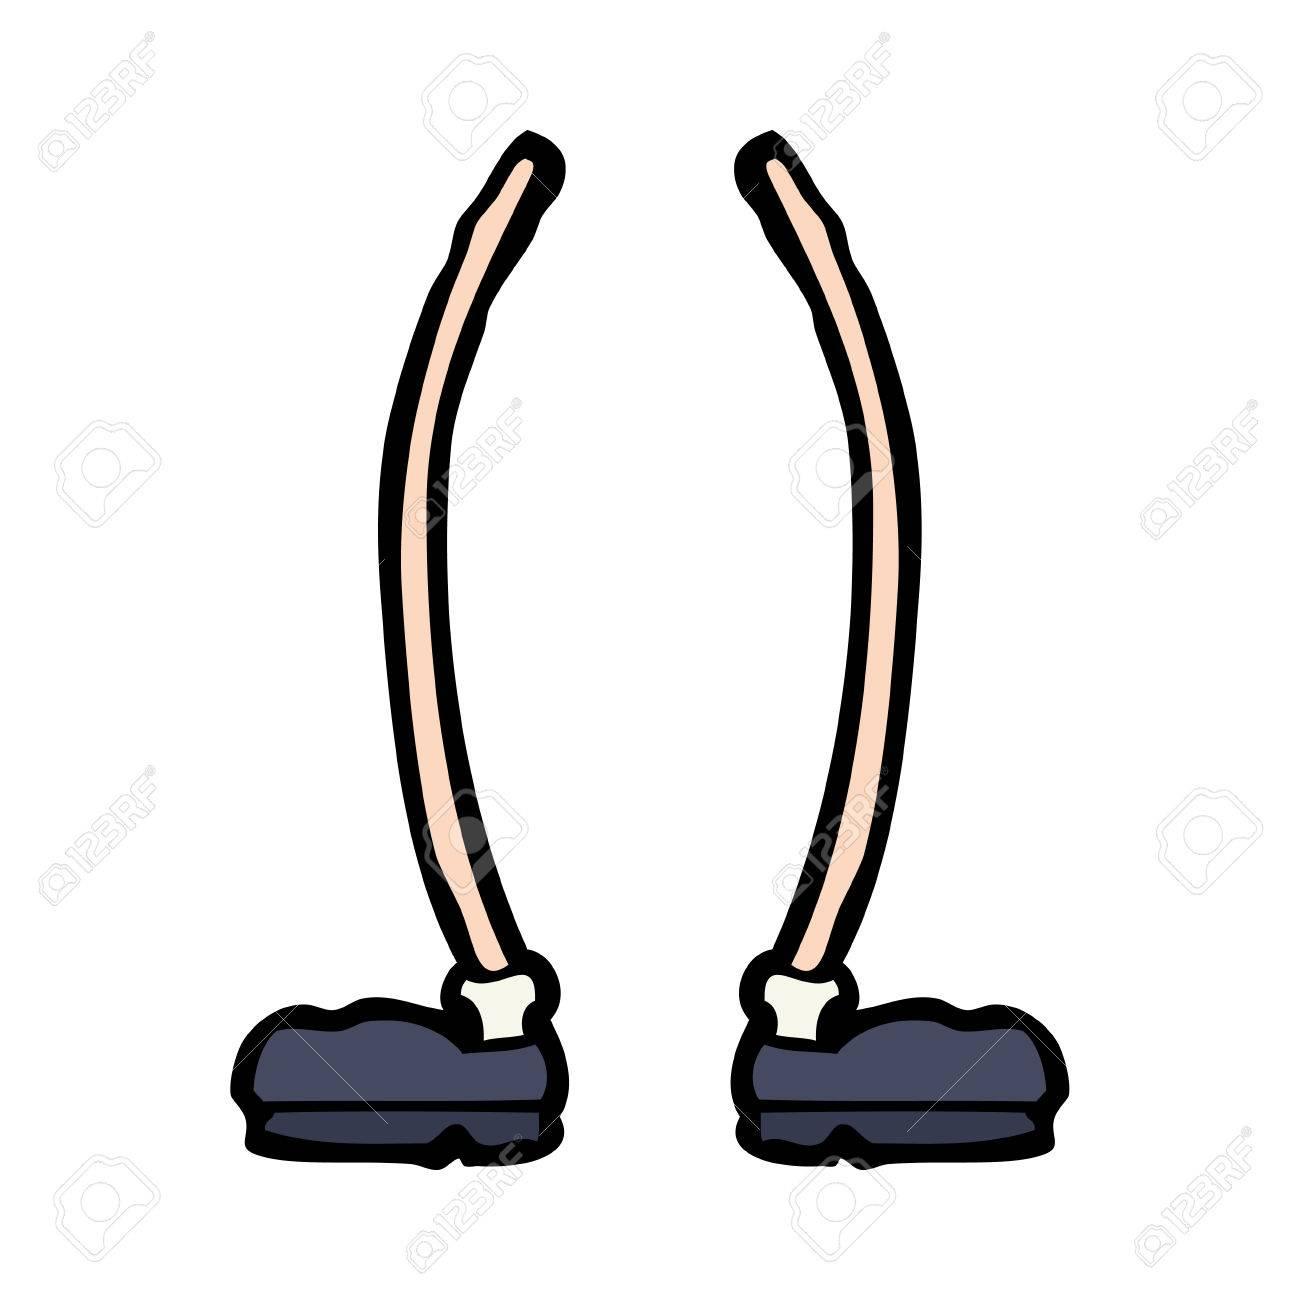 cartoon legs royalty free cliparts vectors and stock illustration rh 123rf com cartoon legs and feet cartoon legs vector